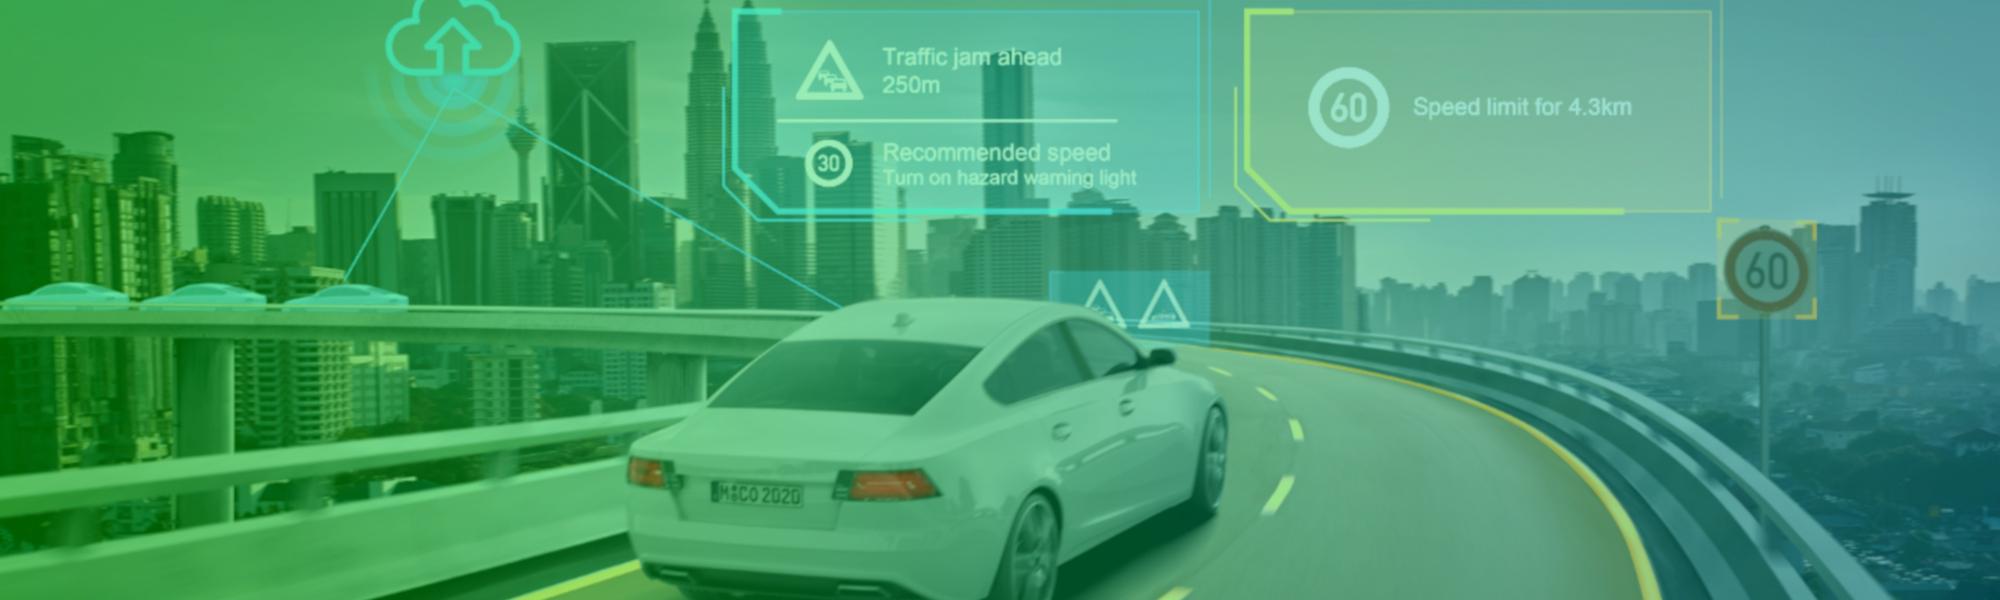 Intelligent Speed Assistance (ISA)